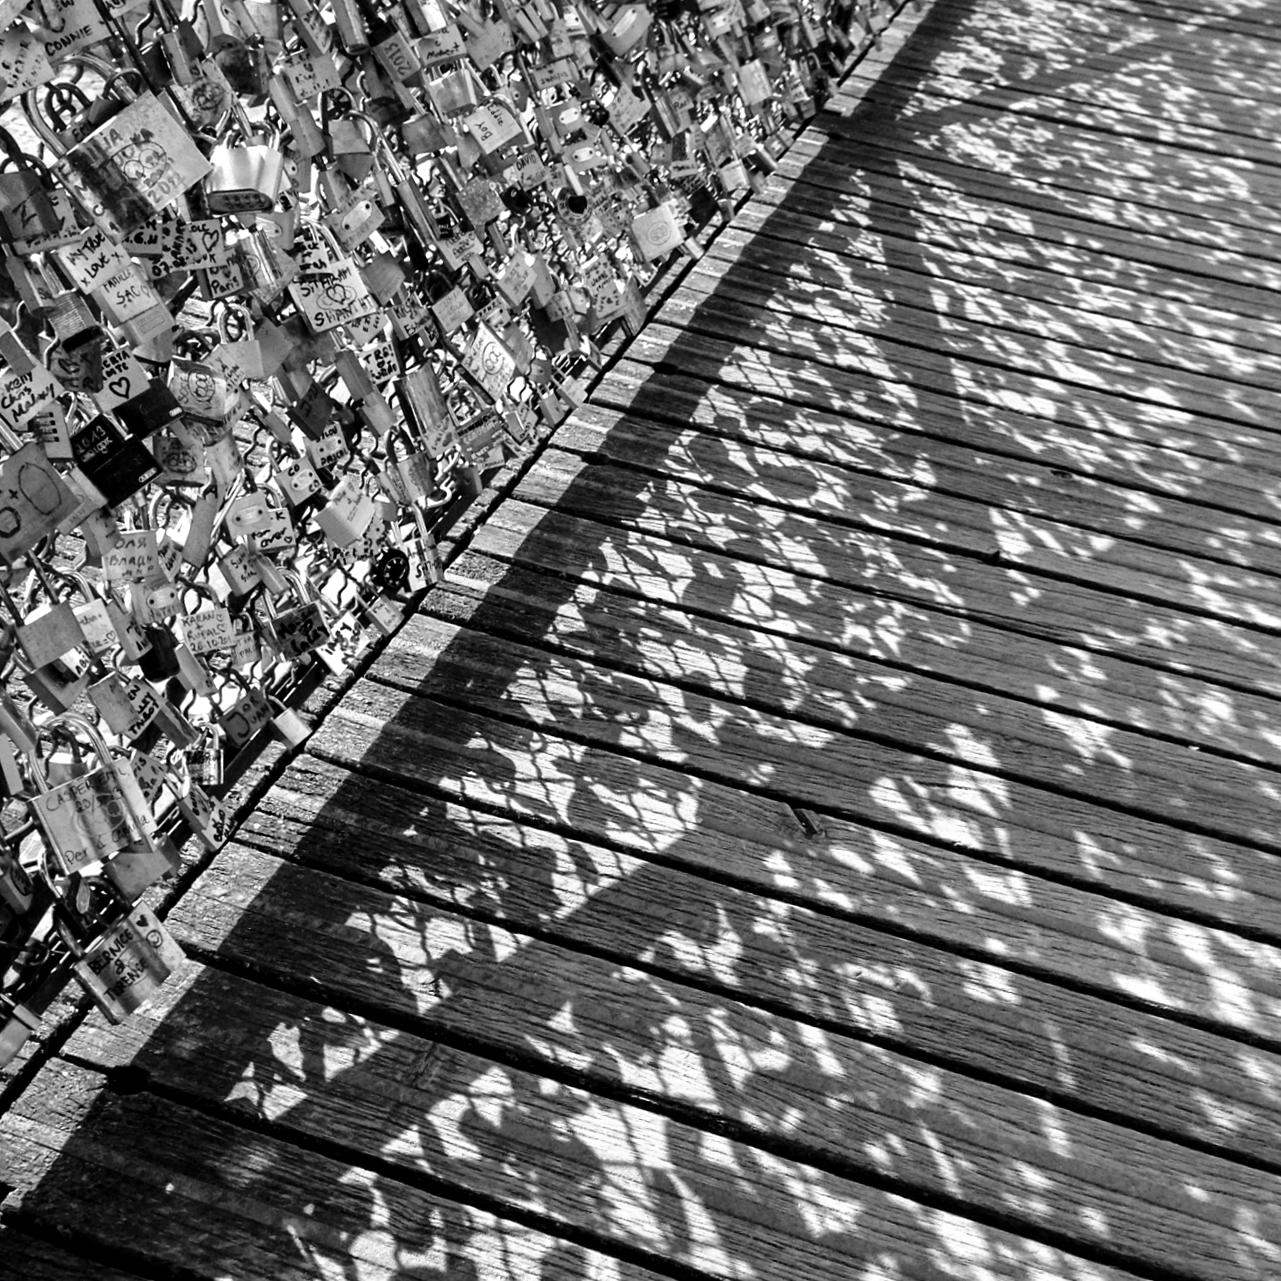 shadows - spring 2013.jpg